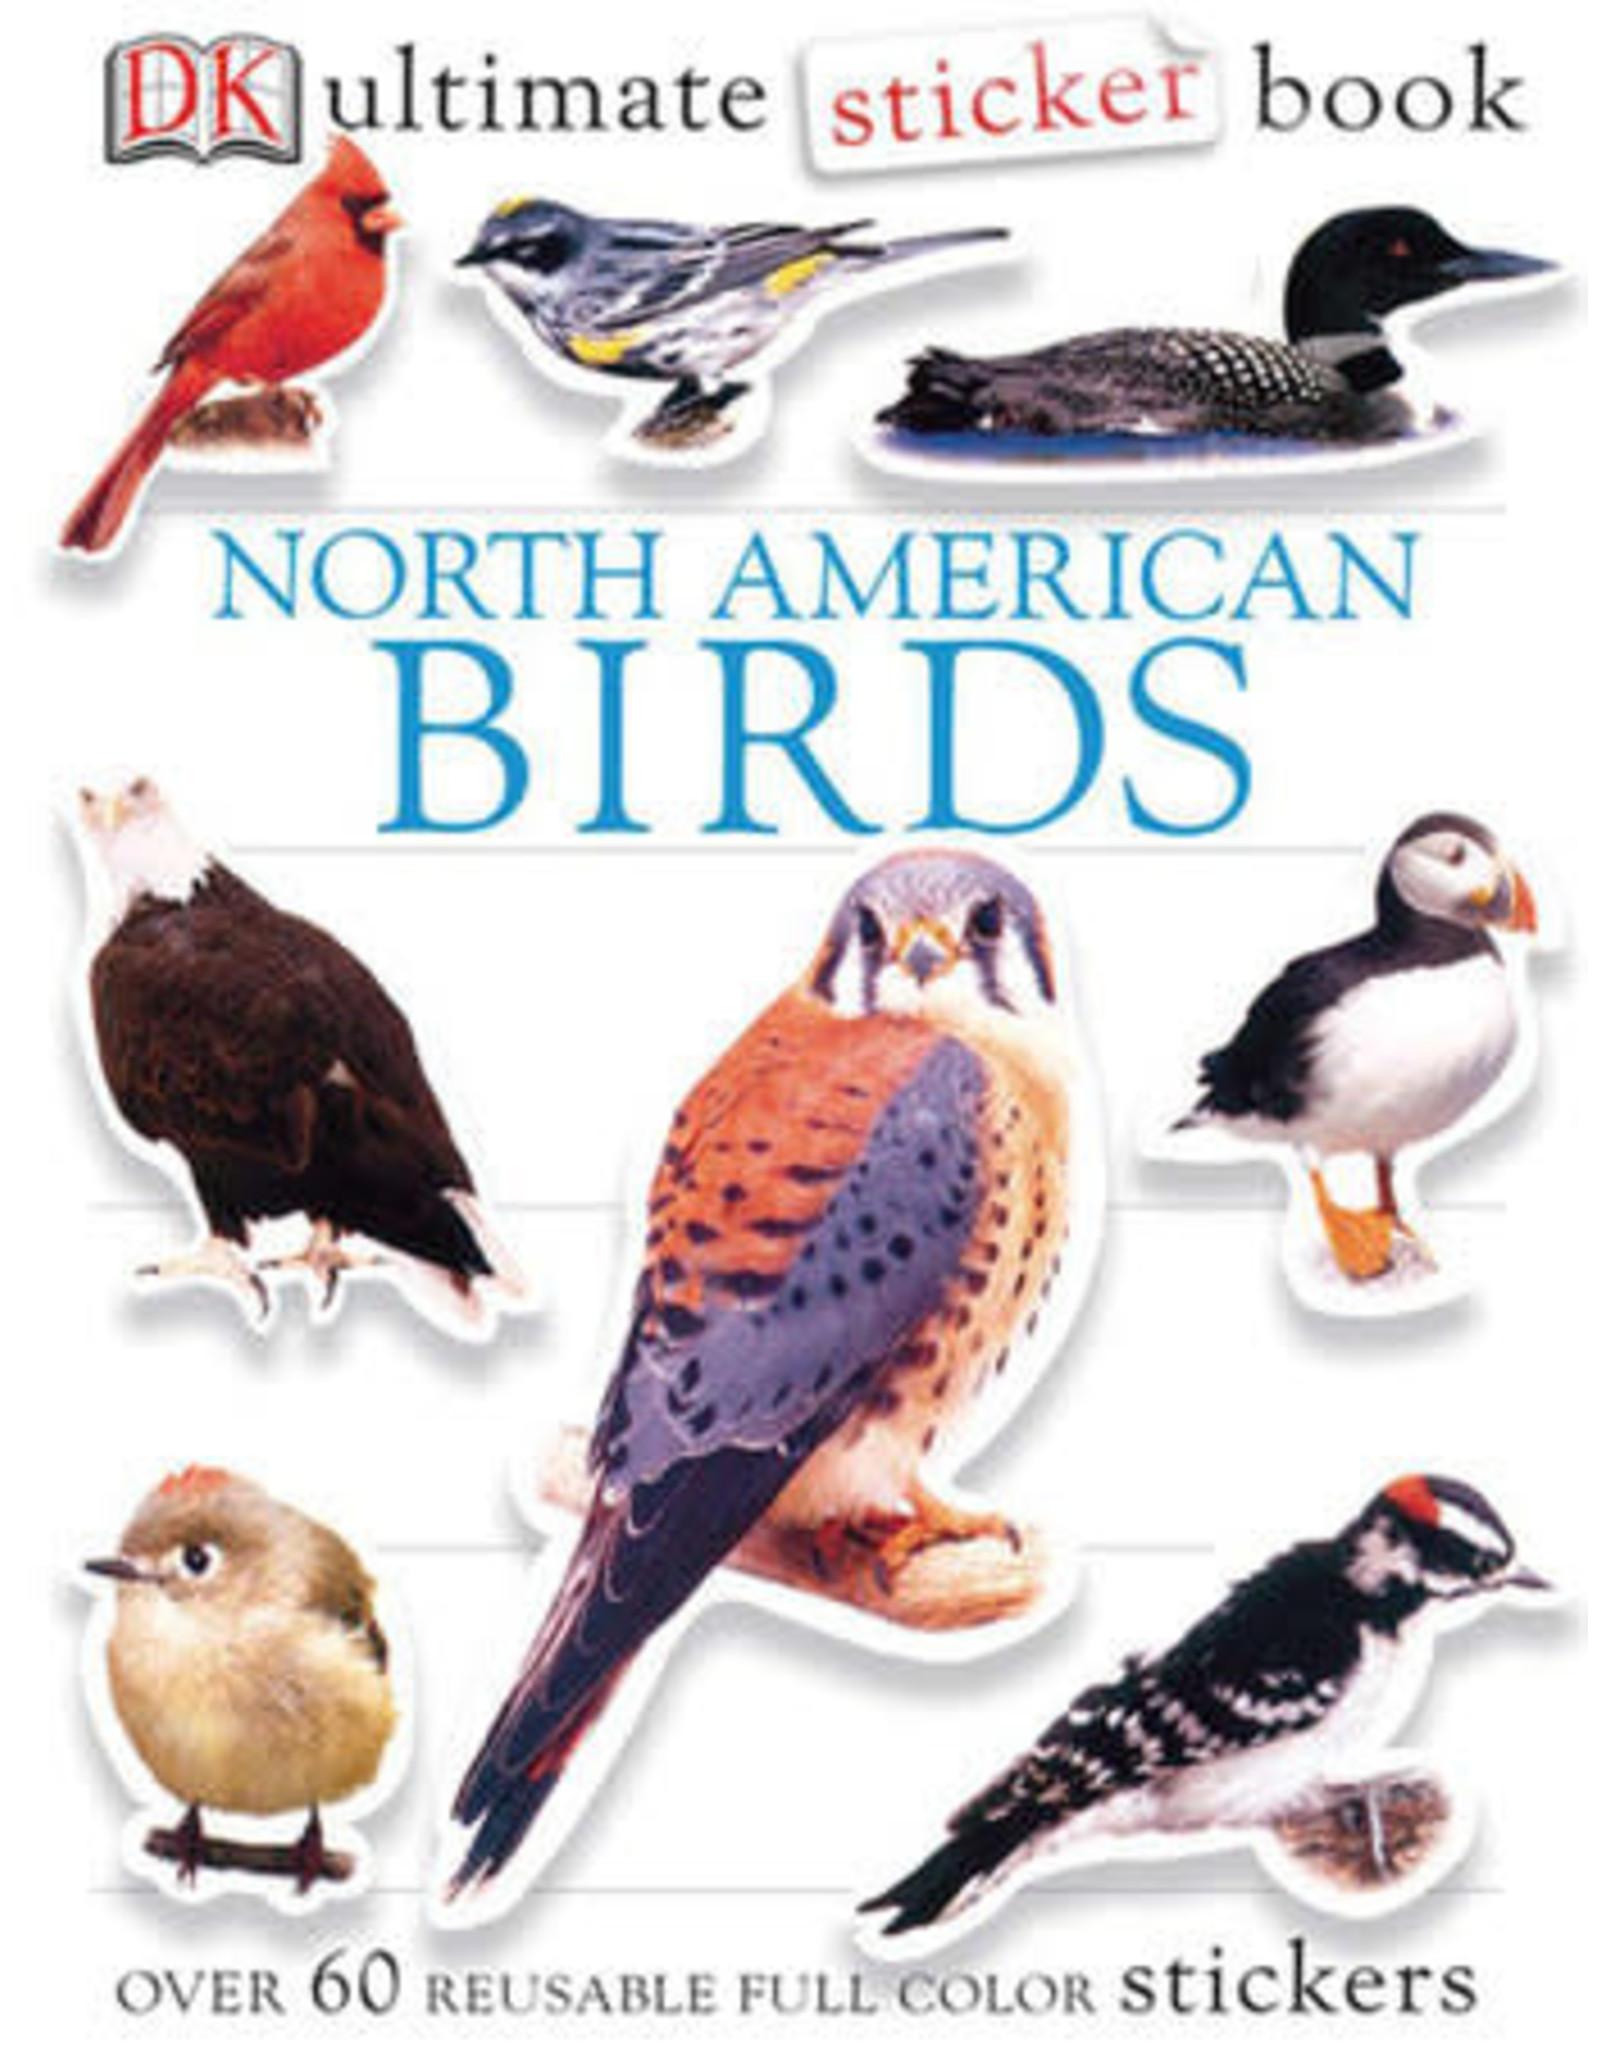 DK North American Birds Ultimate Sticker Book